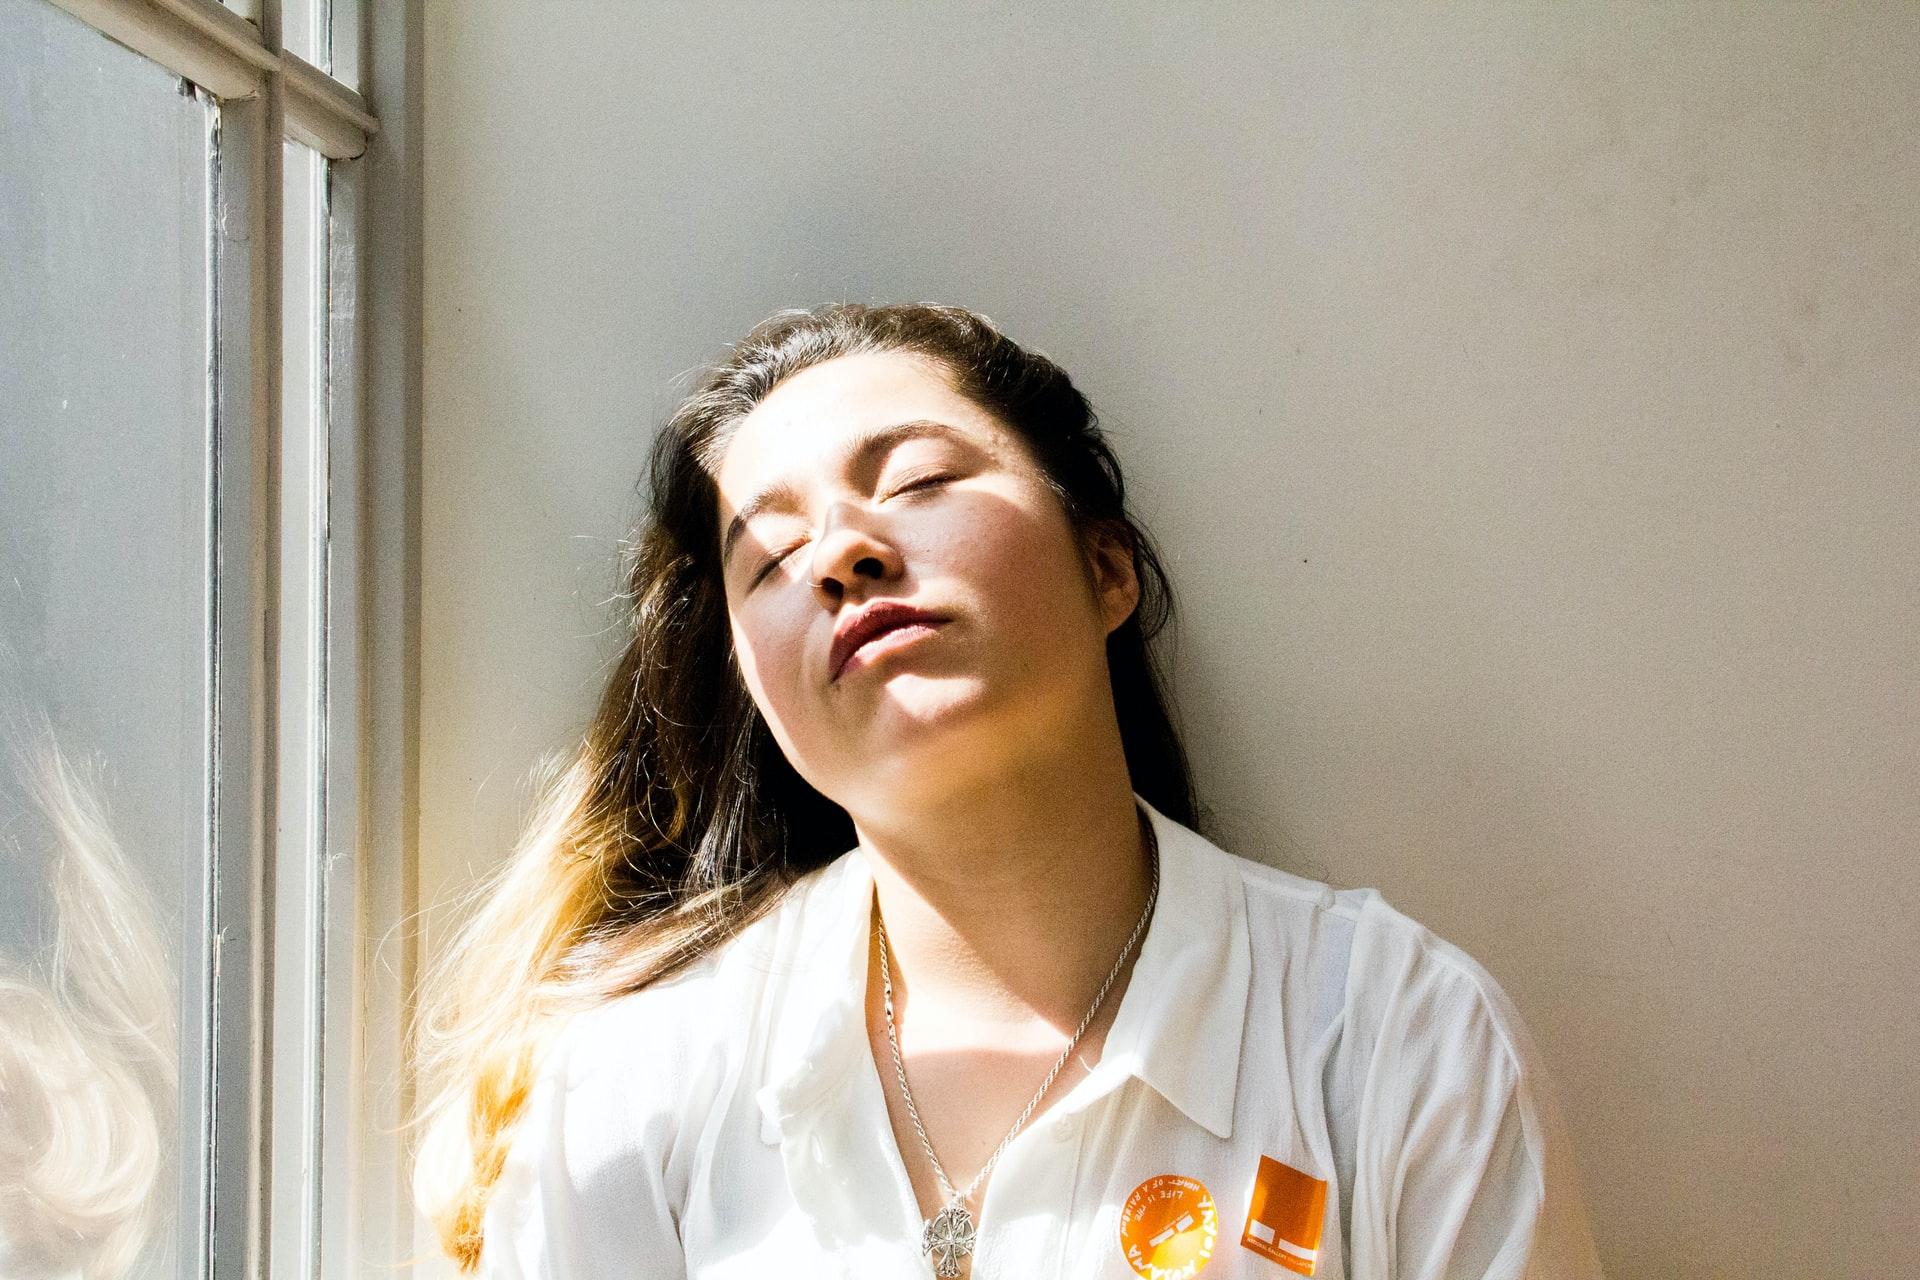 Müde Frau an die Wand geleht - Foto by Stacey Gabrielle Koenitz Rozells